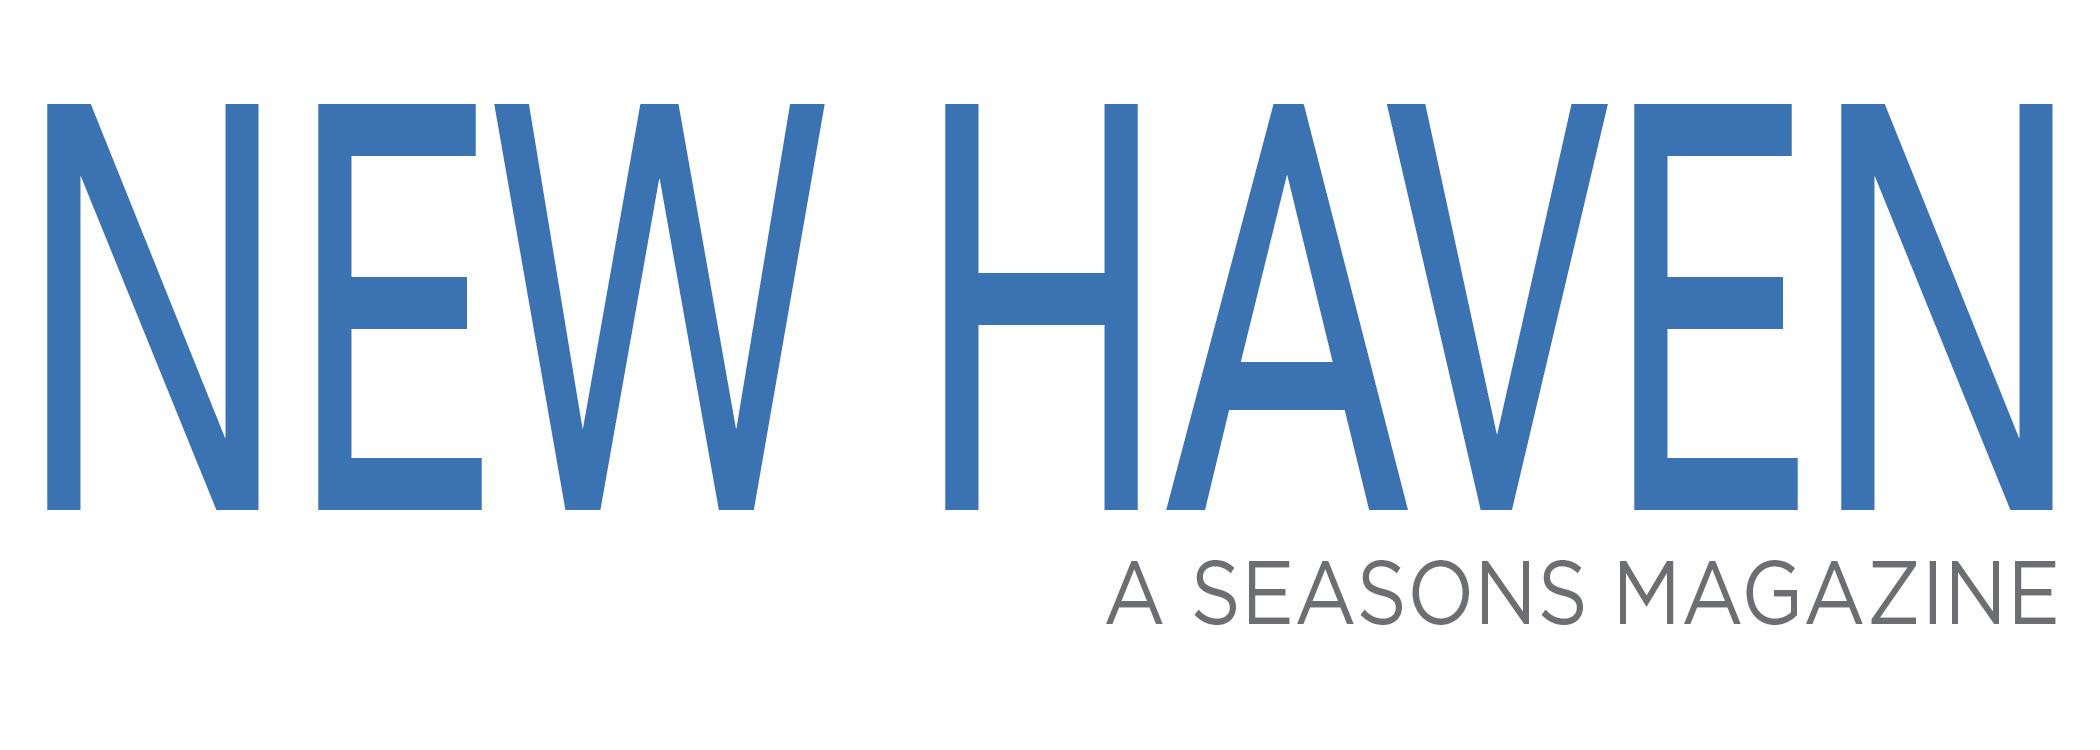 New Haven - A Seasons Magazine